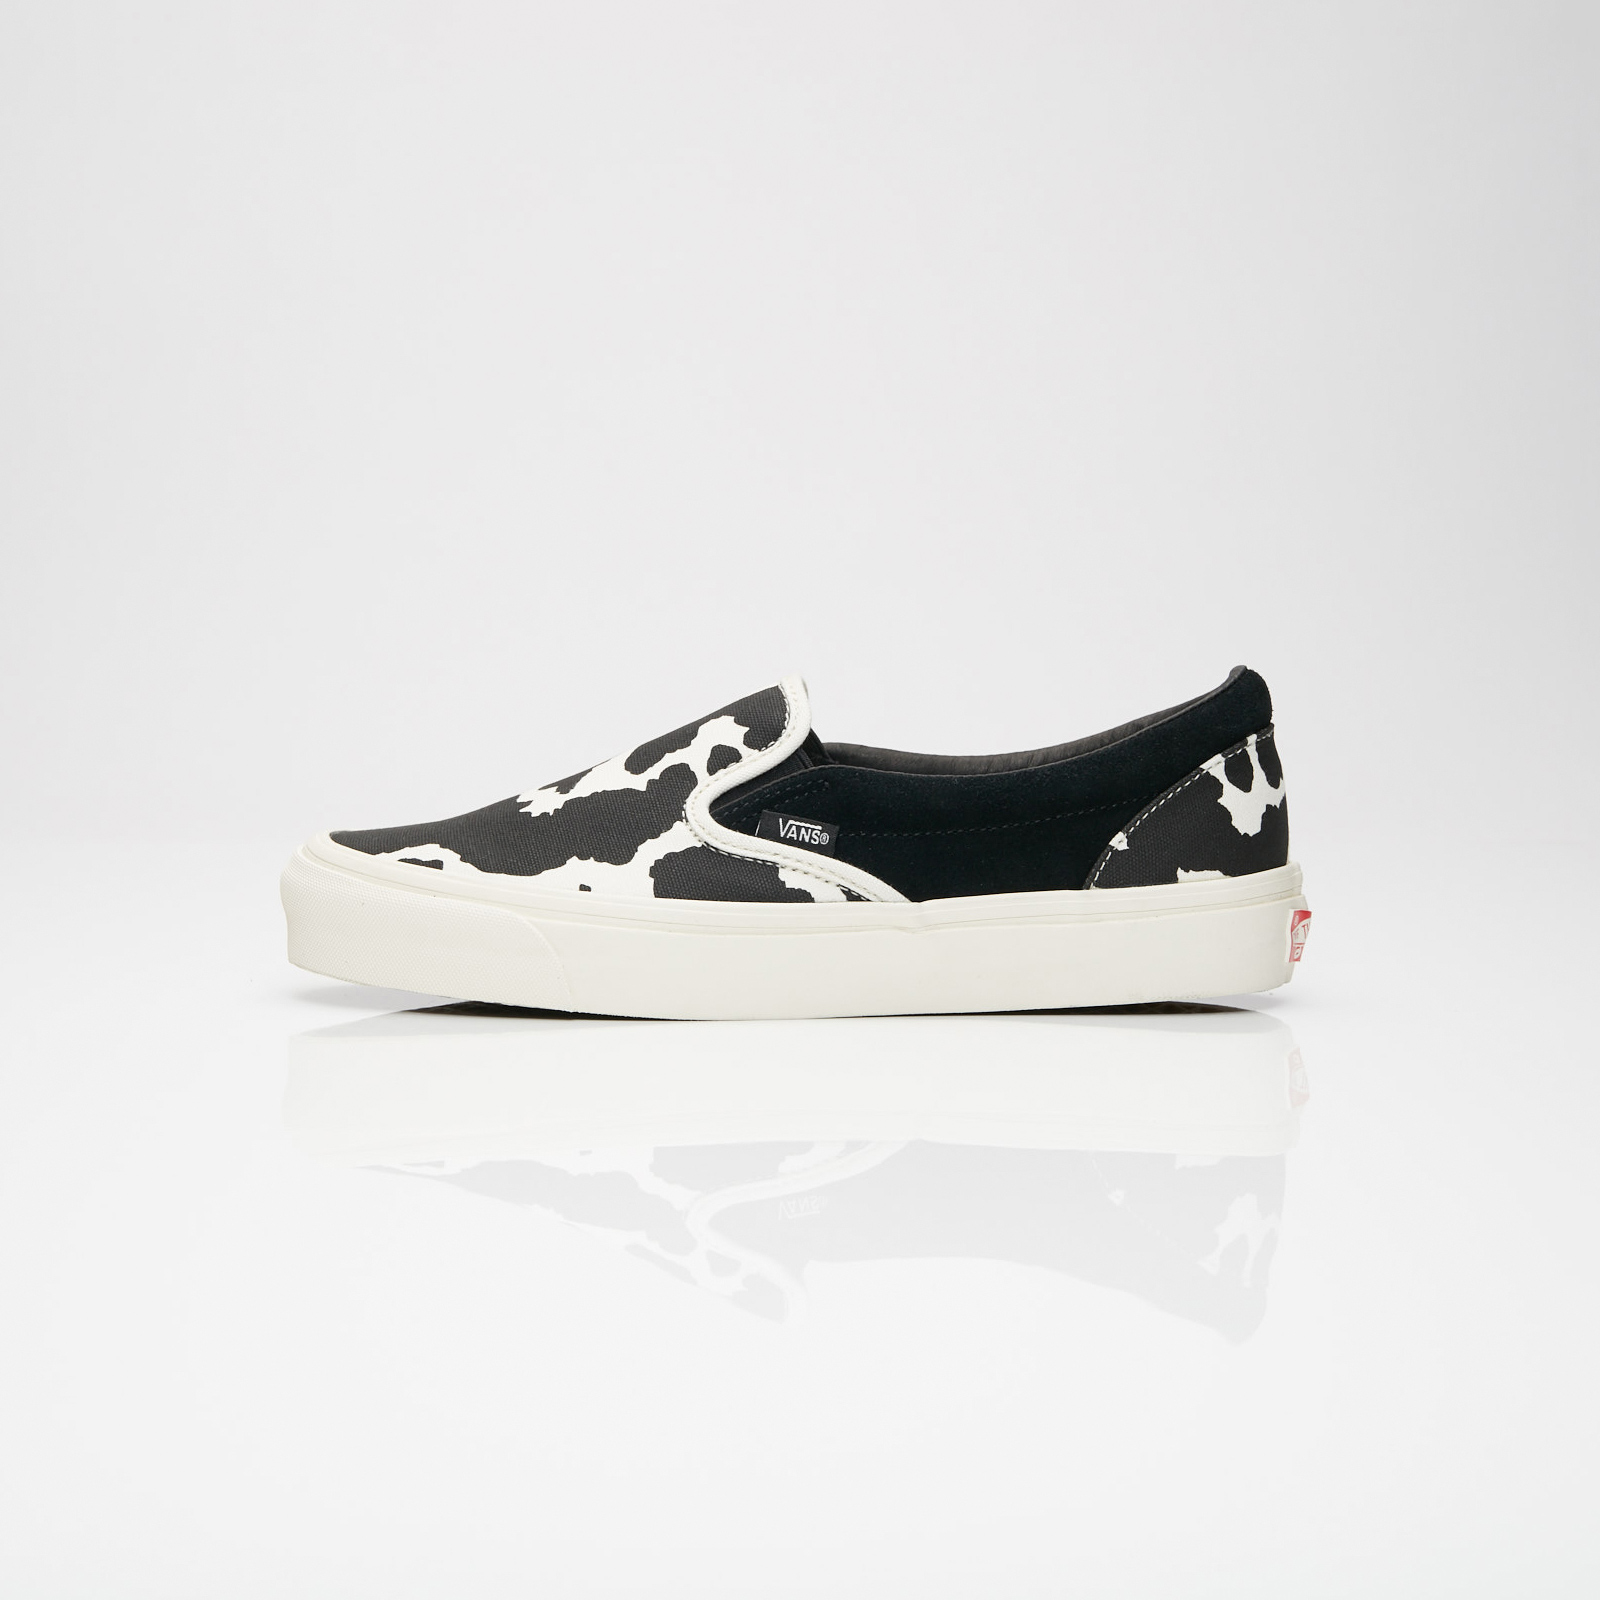 a3cb2e7a5e Vans UA OG Classic Slip-On LX - V00udfu9o - Sneakersnstuff ...